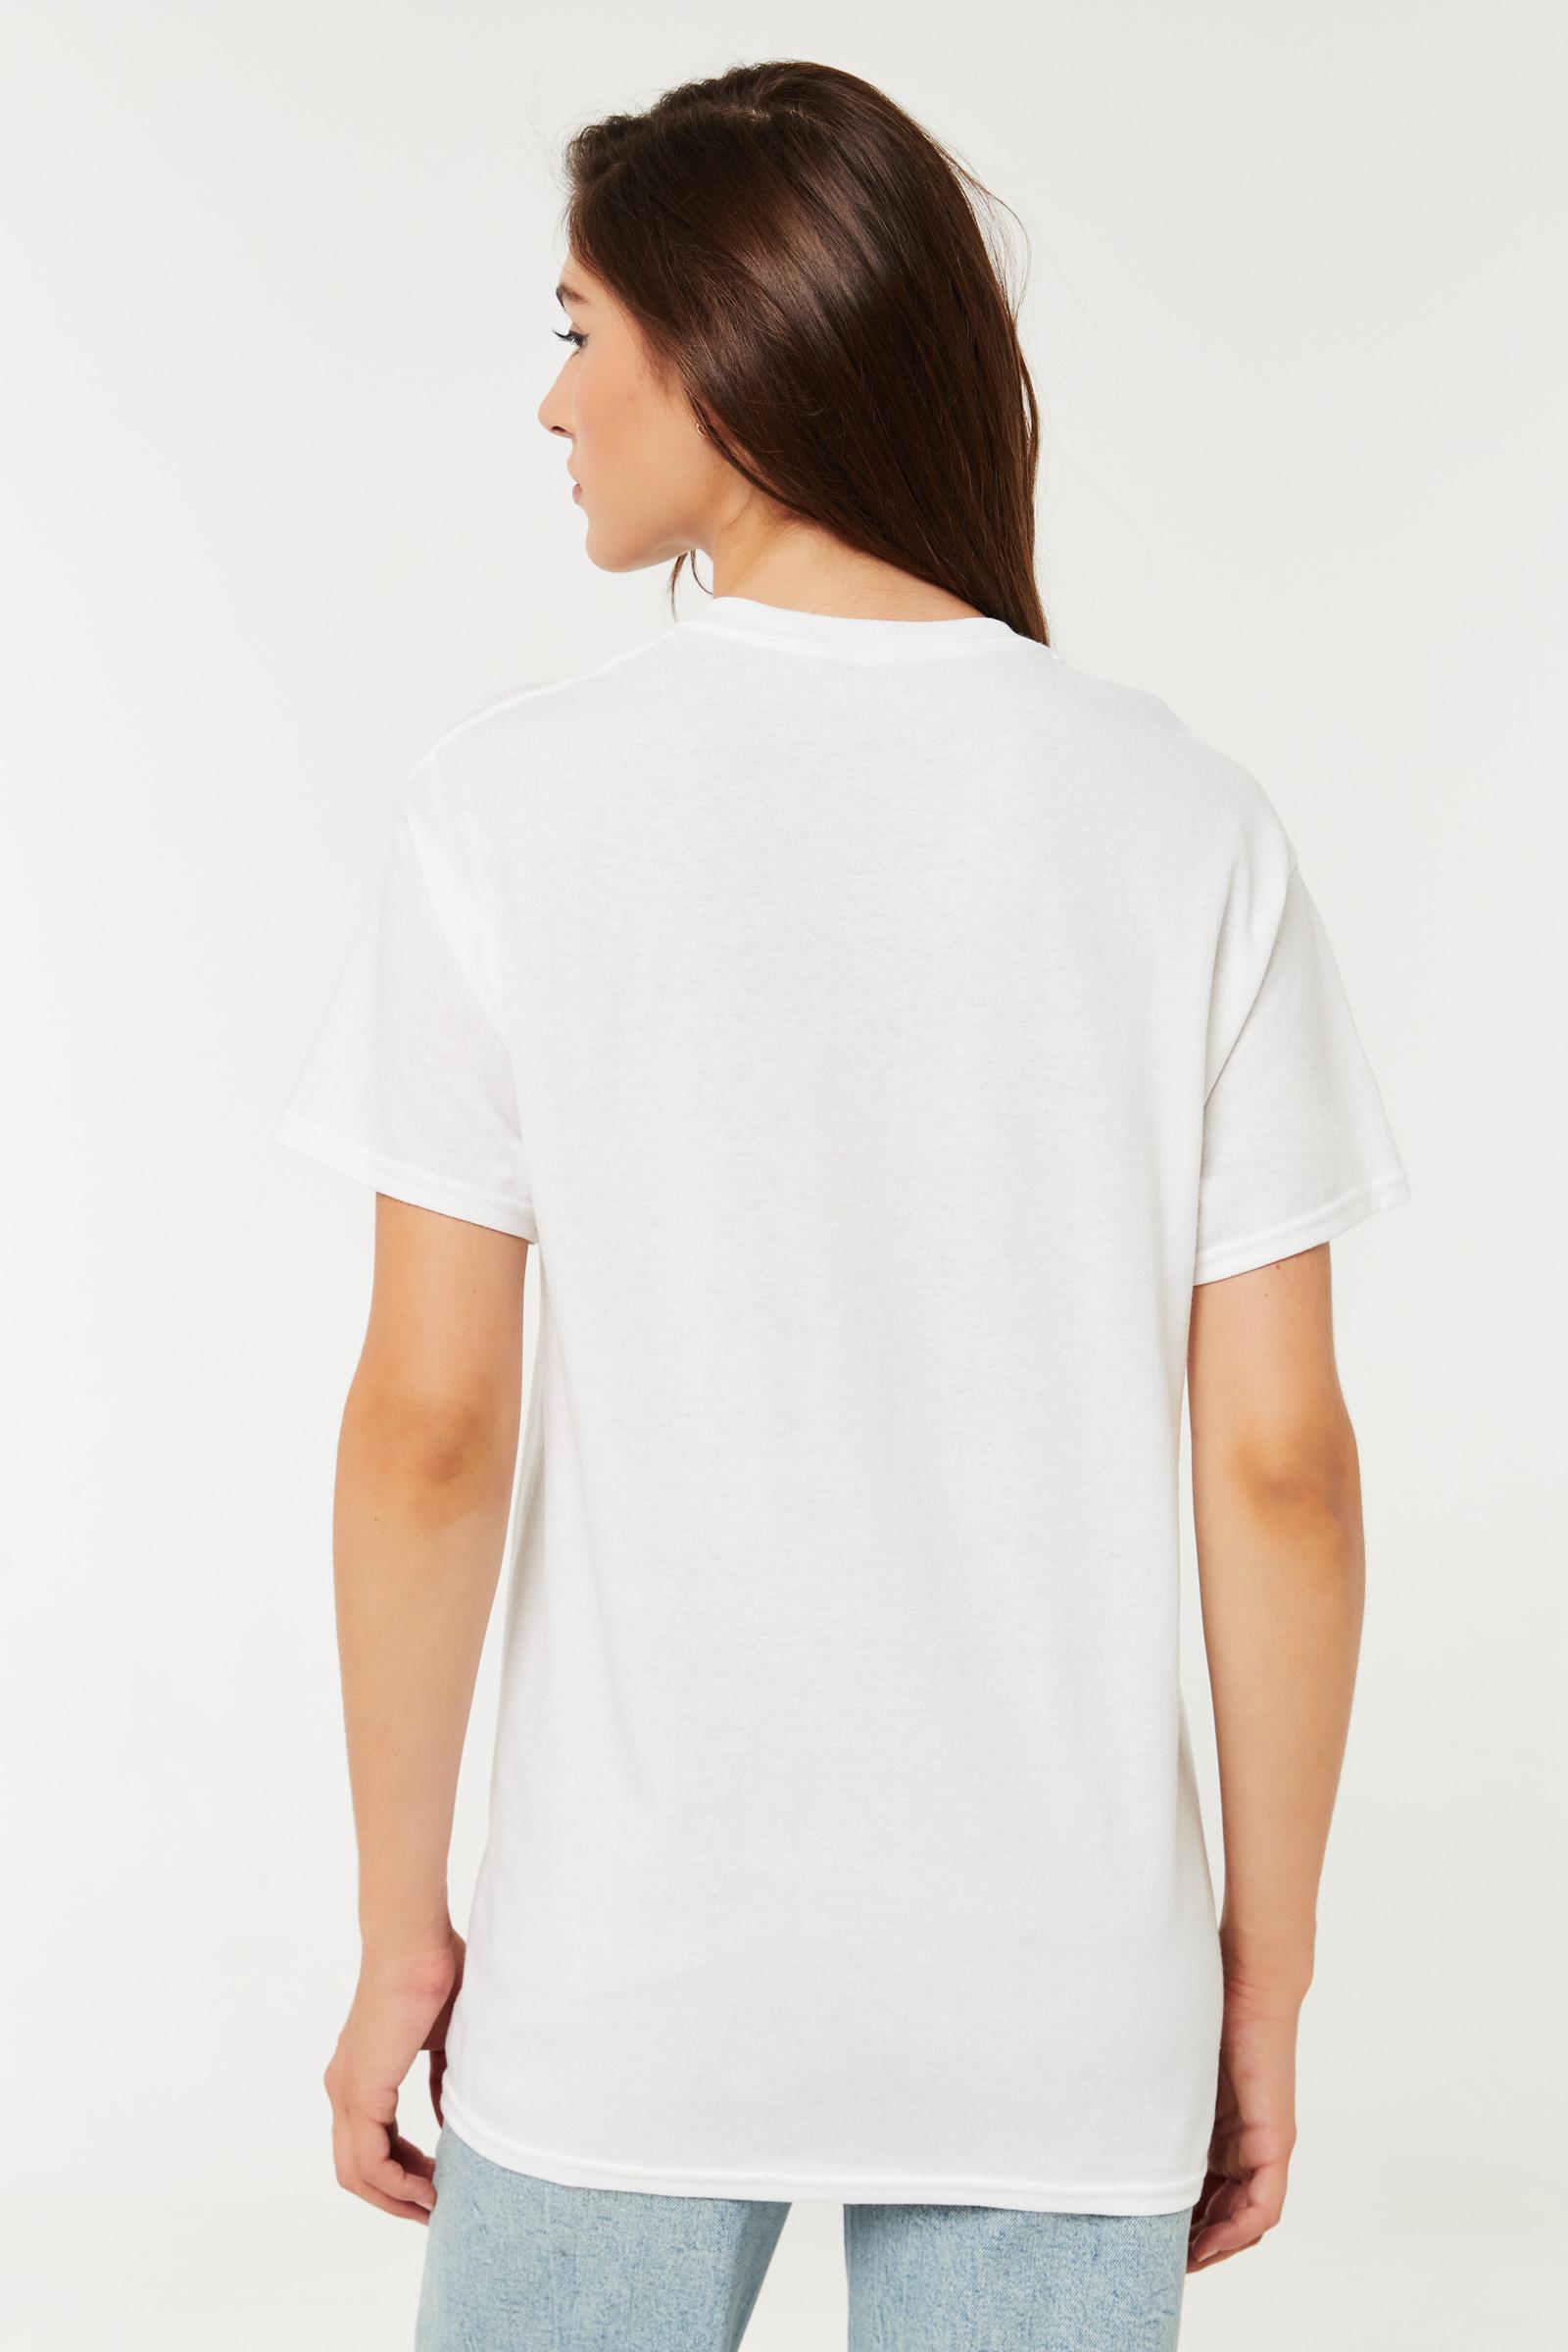 Napoleon Dynamite T-Shirt